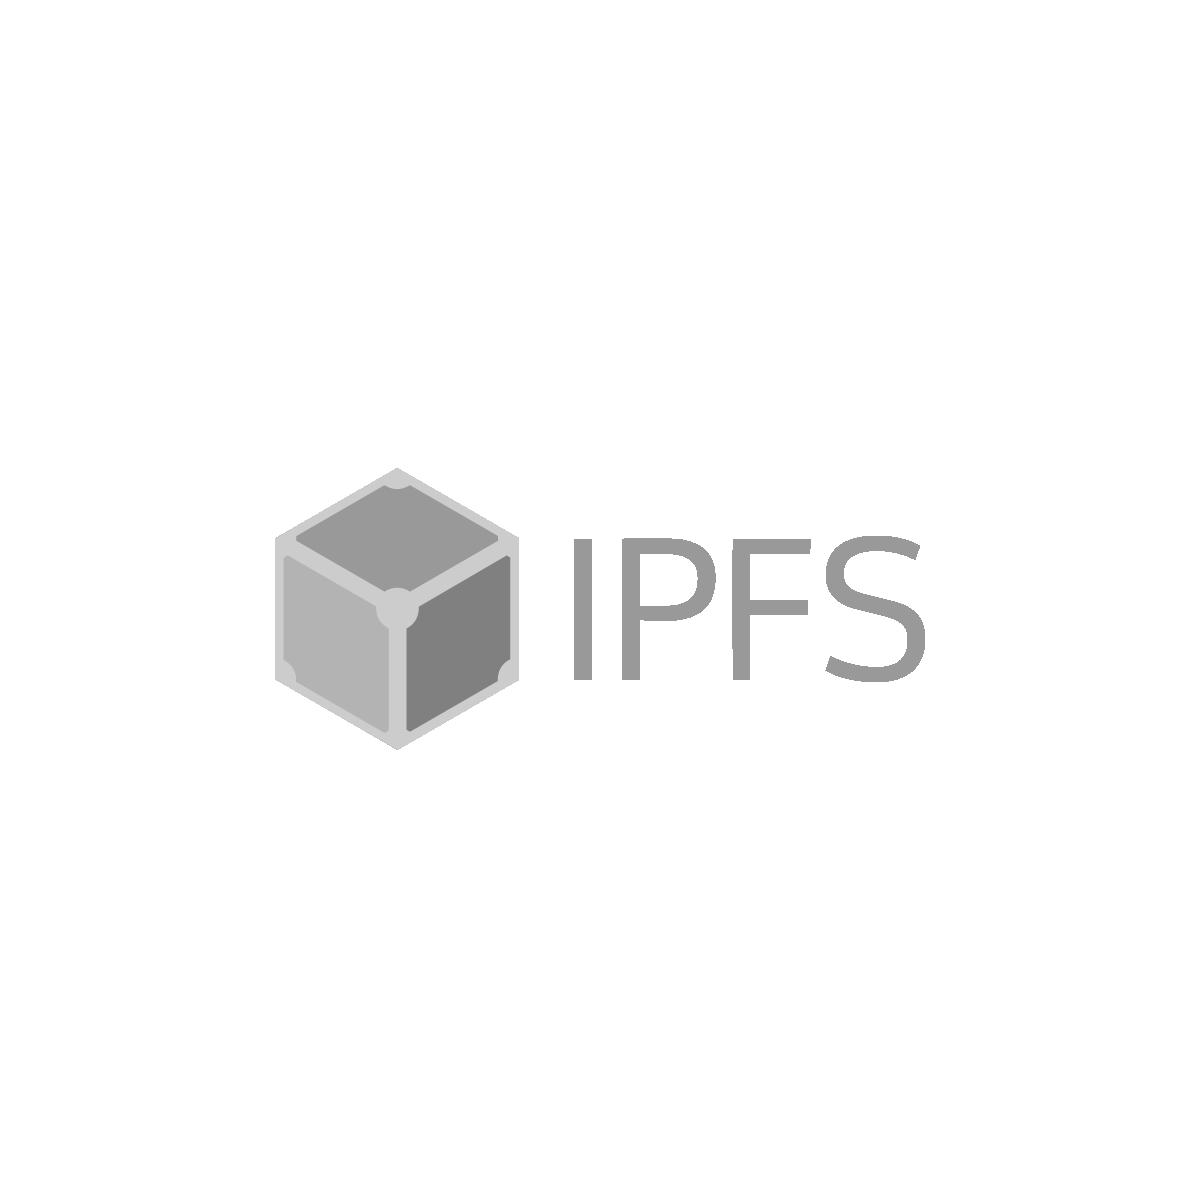 ipfs logo-01.png